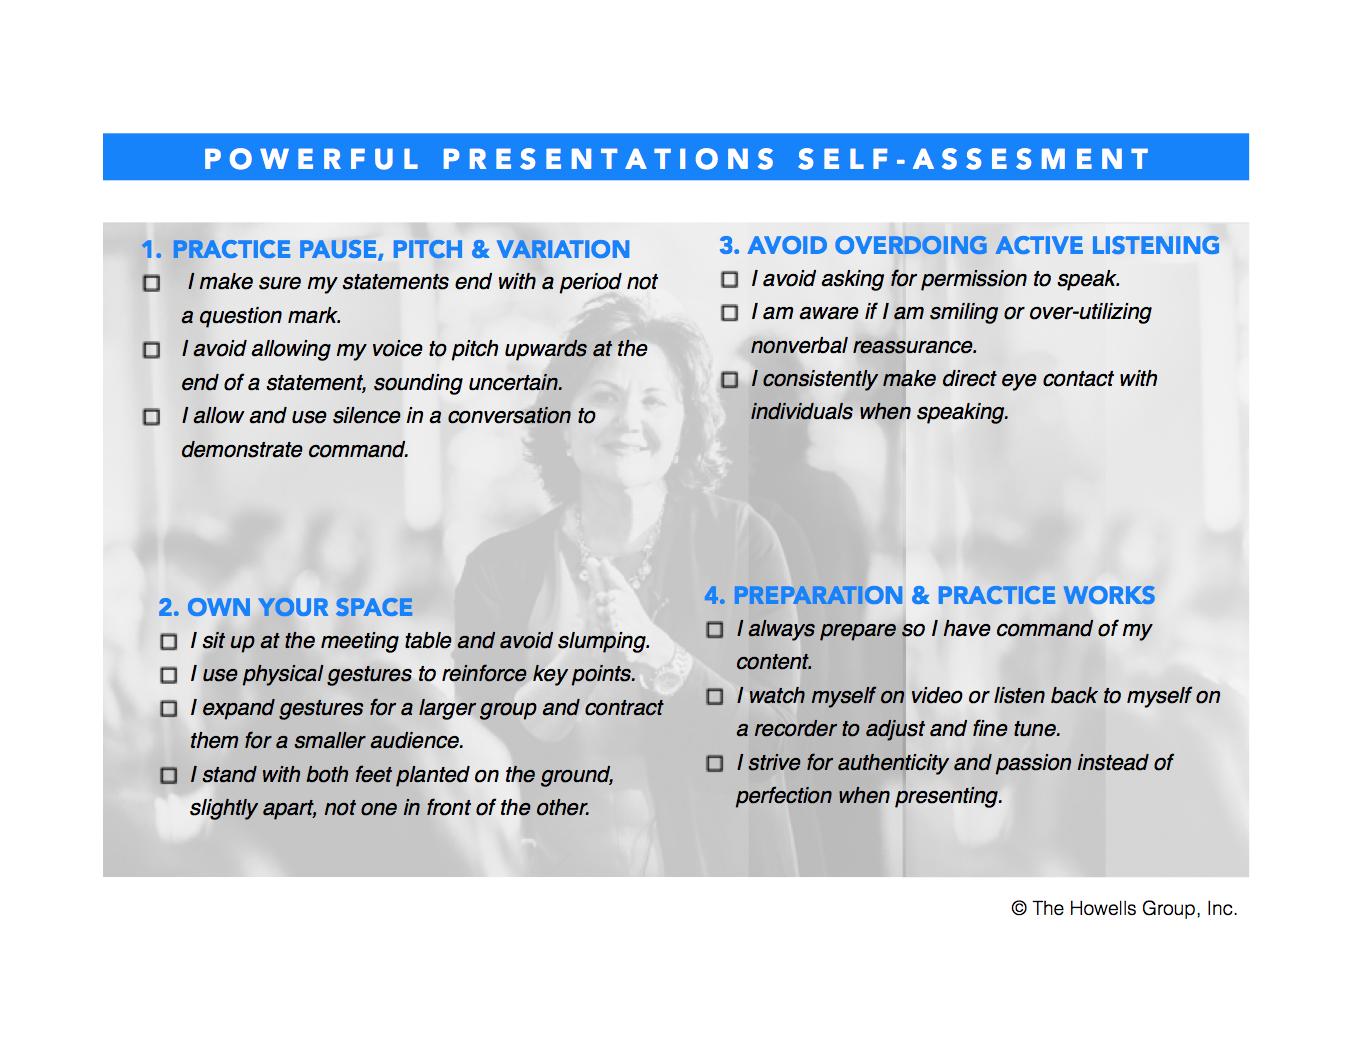 Powerful Presentations Self-Assessment